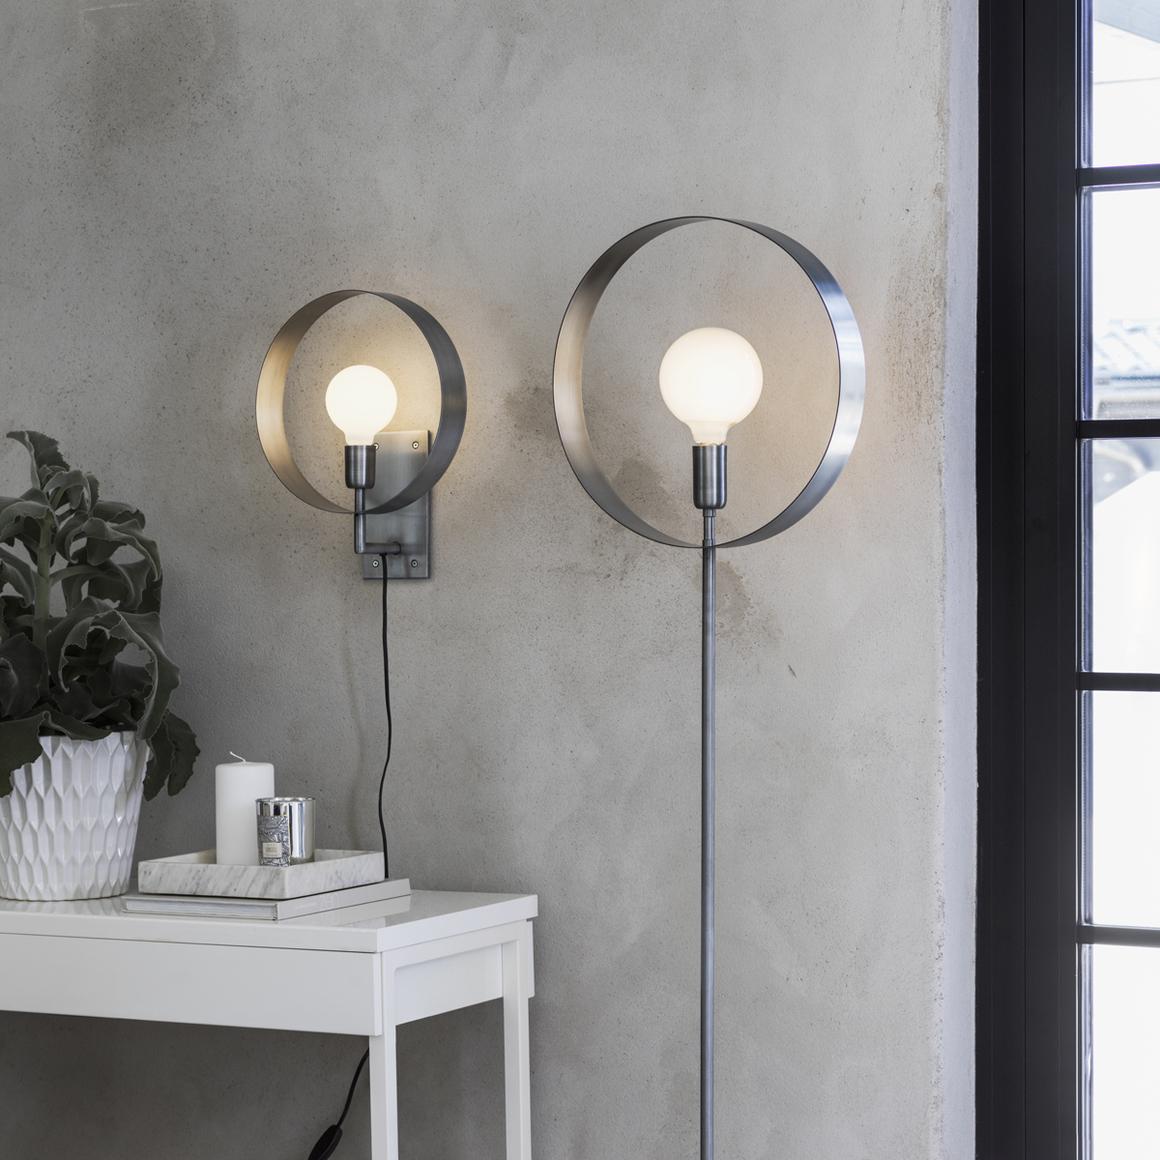 Pale silver Atmosphere vägglampa & golvlampa